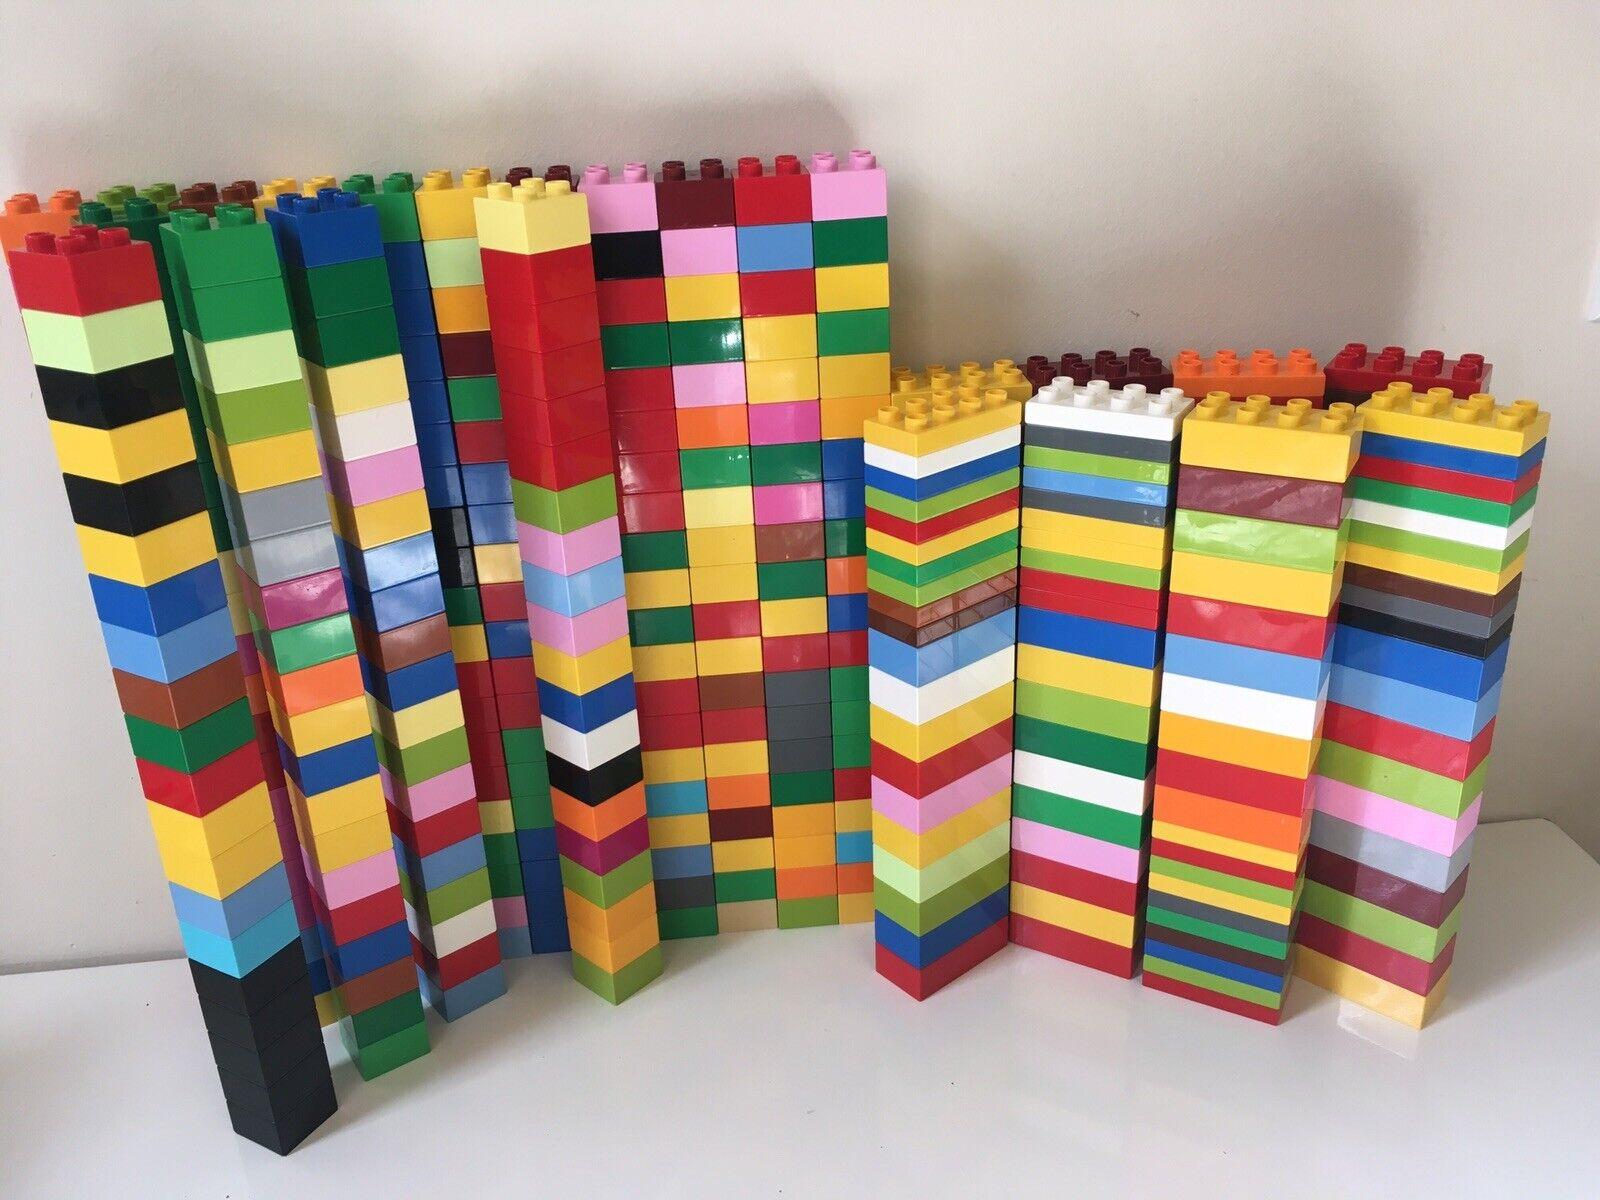 60 Lego Duplo 2X4 bricks red yellow blue green